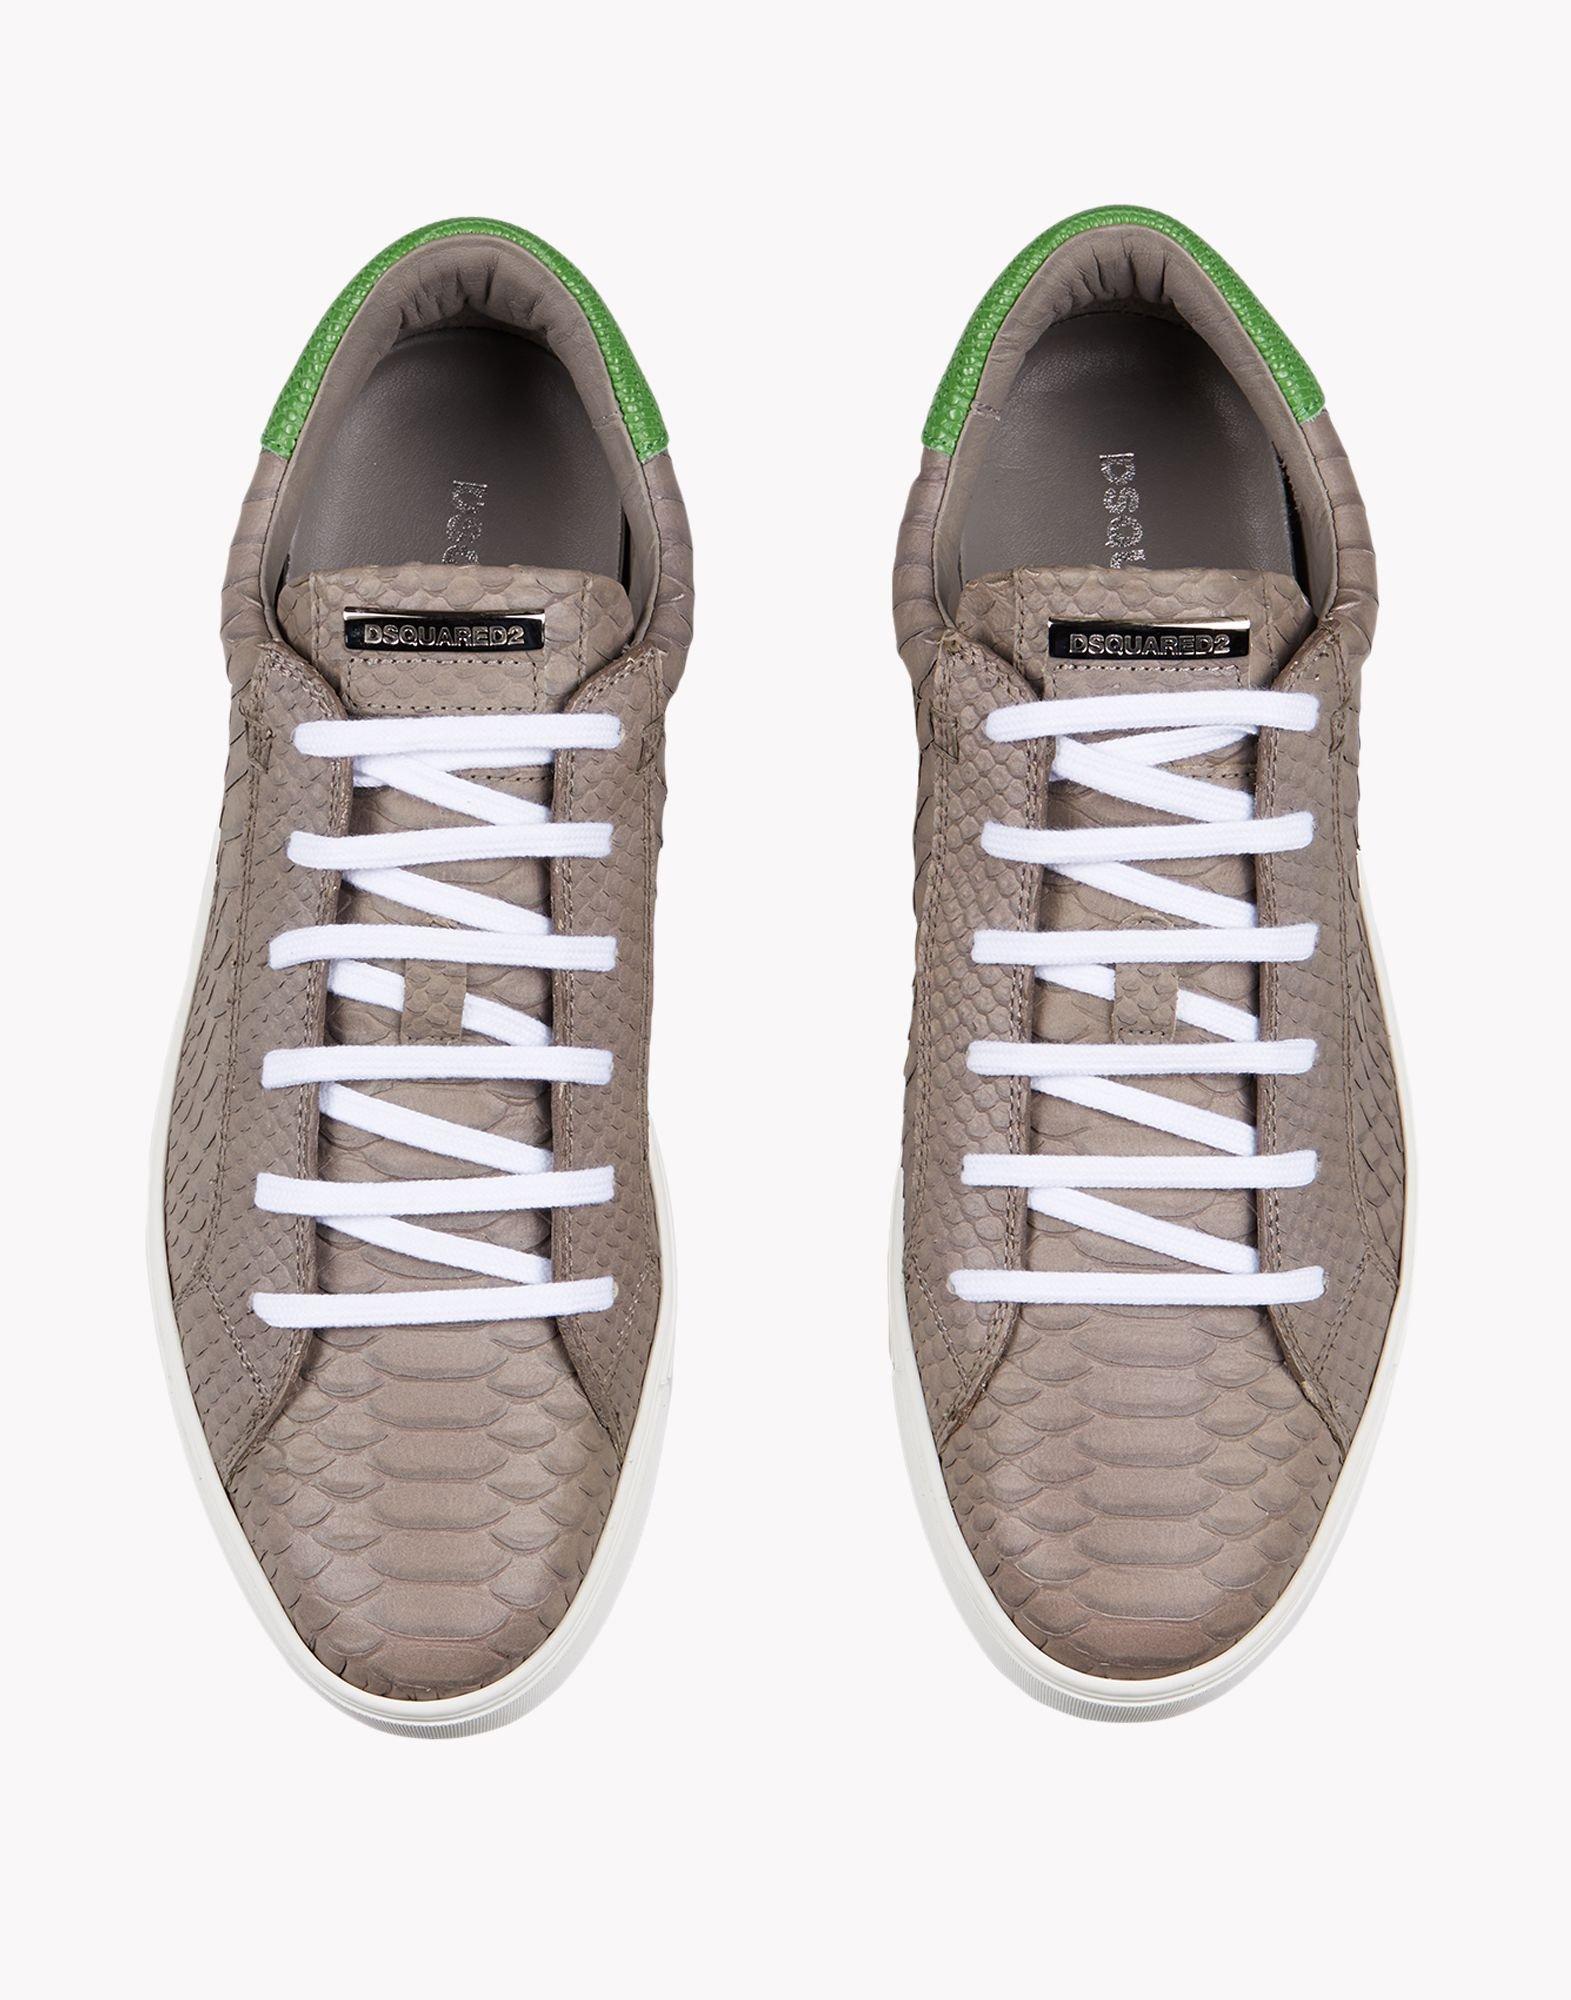 Dsquared2 Tennis Club sneakers edg8FKVjoS